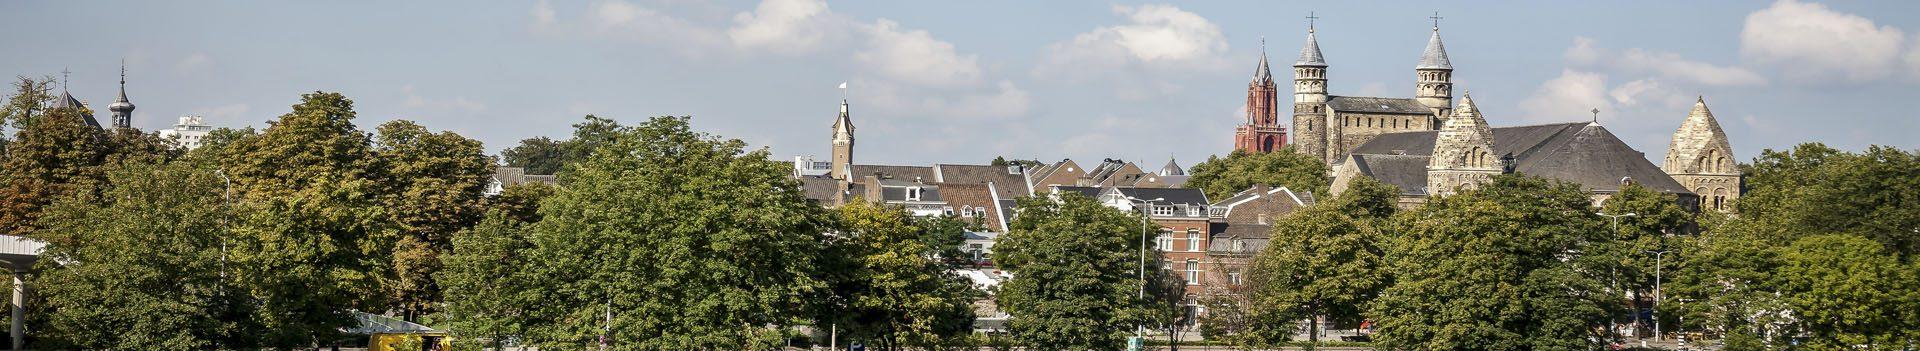 NGKv Zuiderkruis gemeente - Maastricht